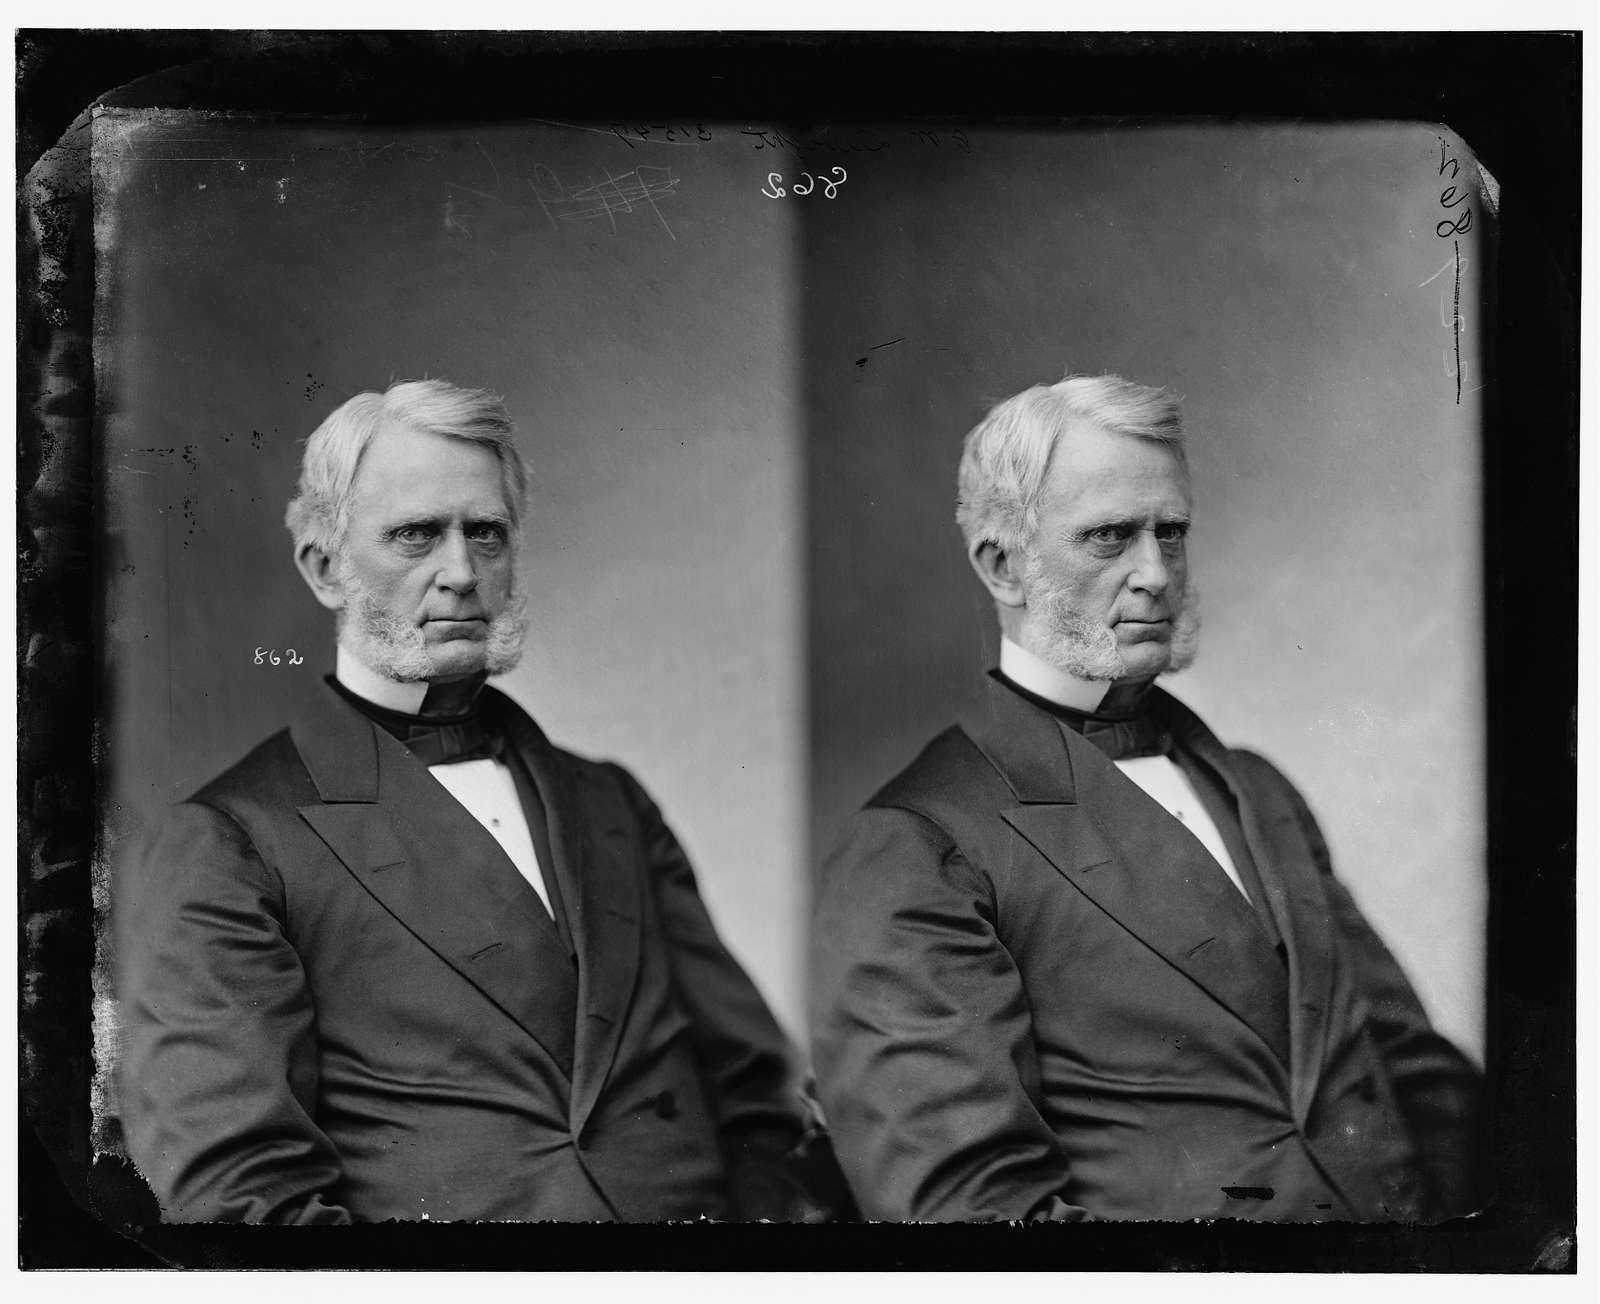 Dwight, Hon. Jeremiah Wilbur of NY